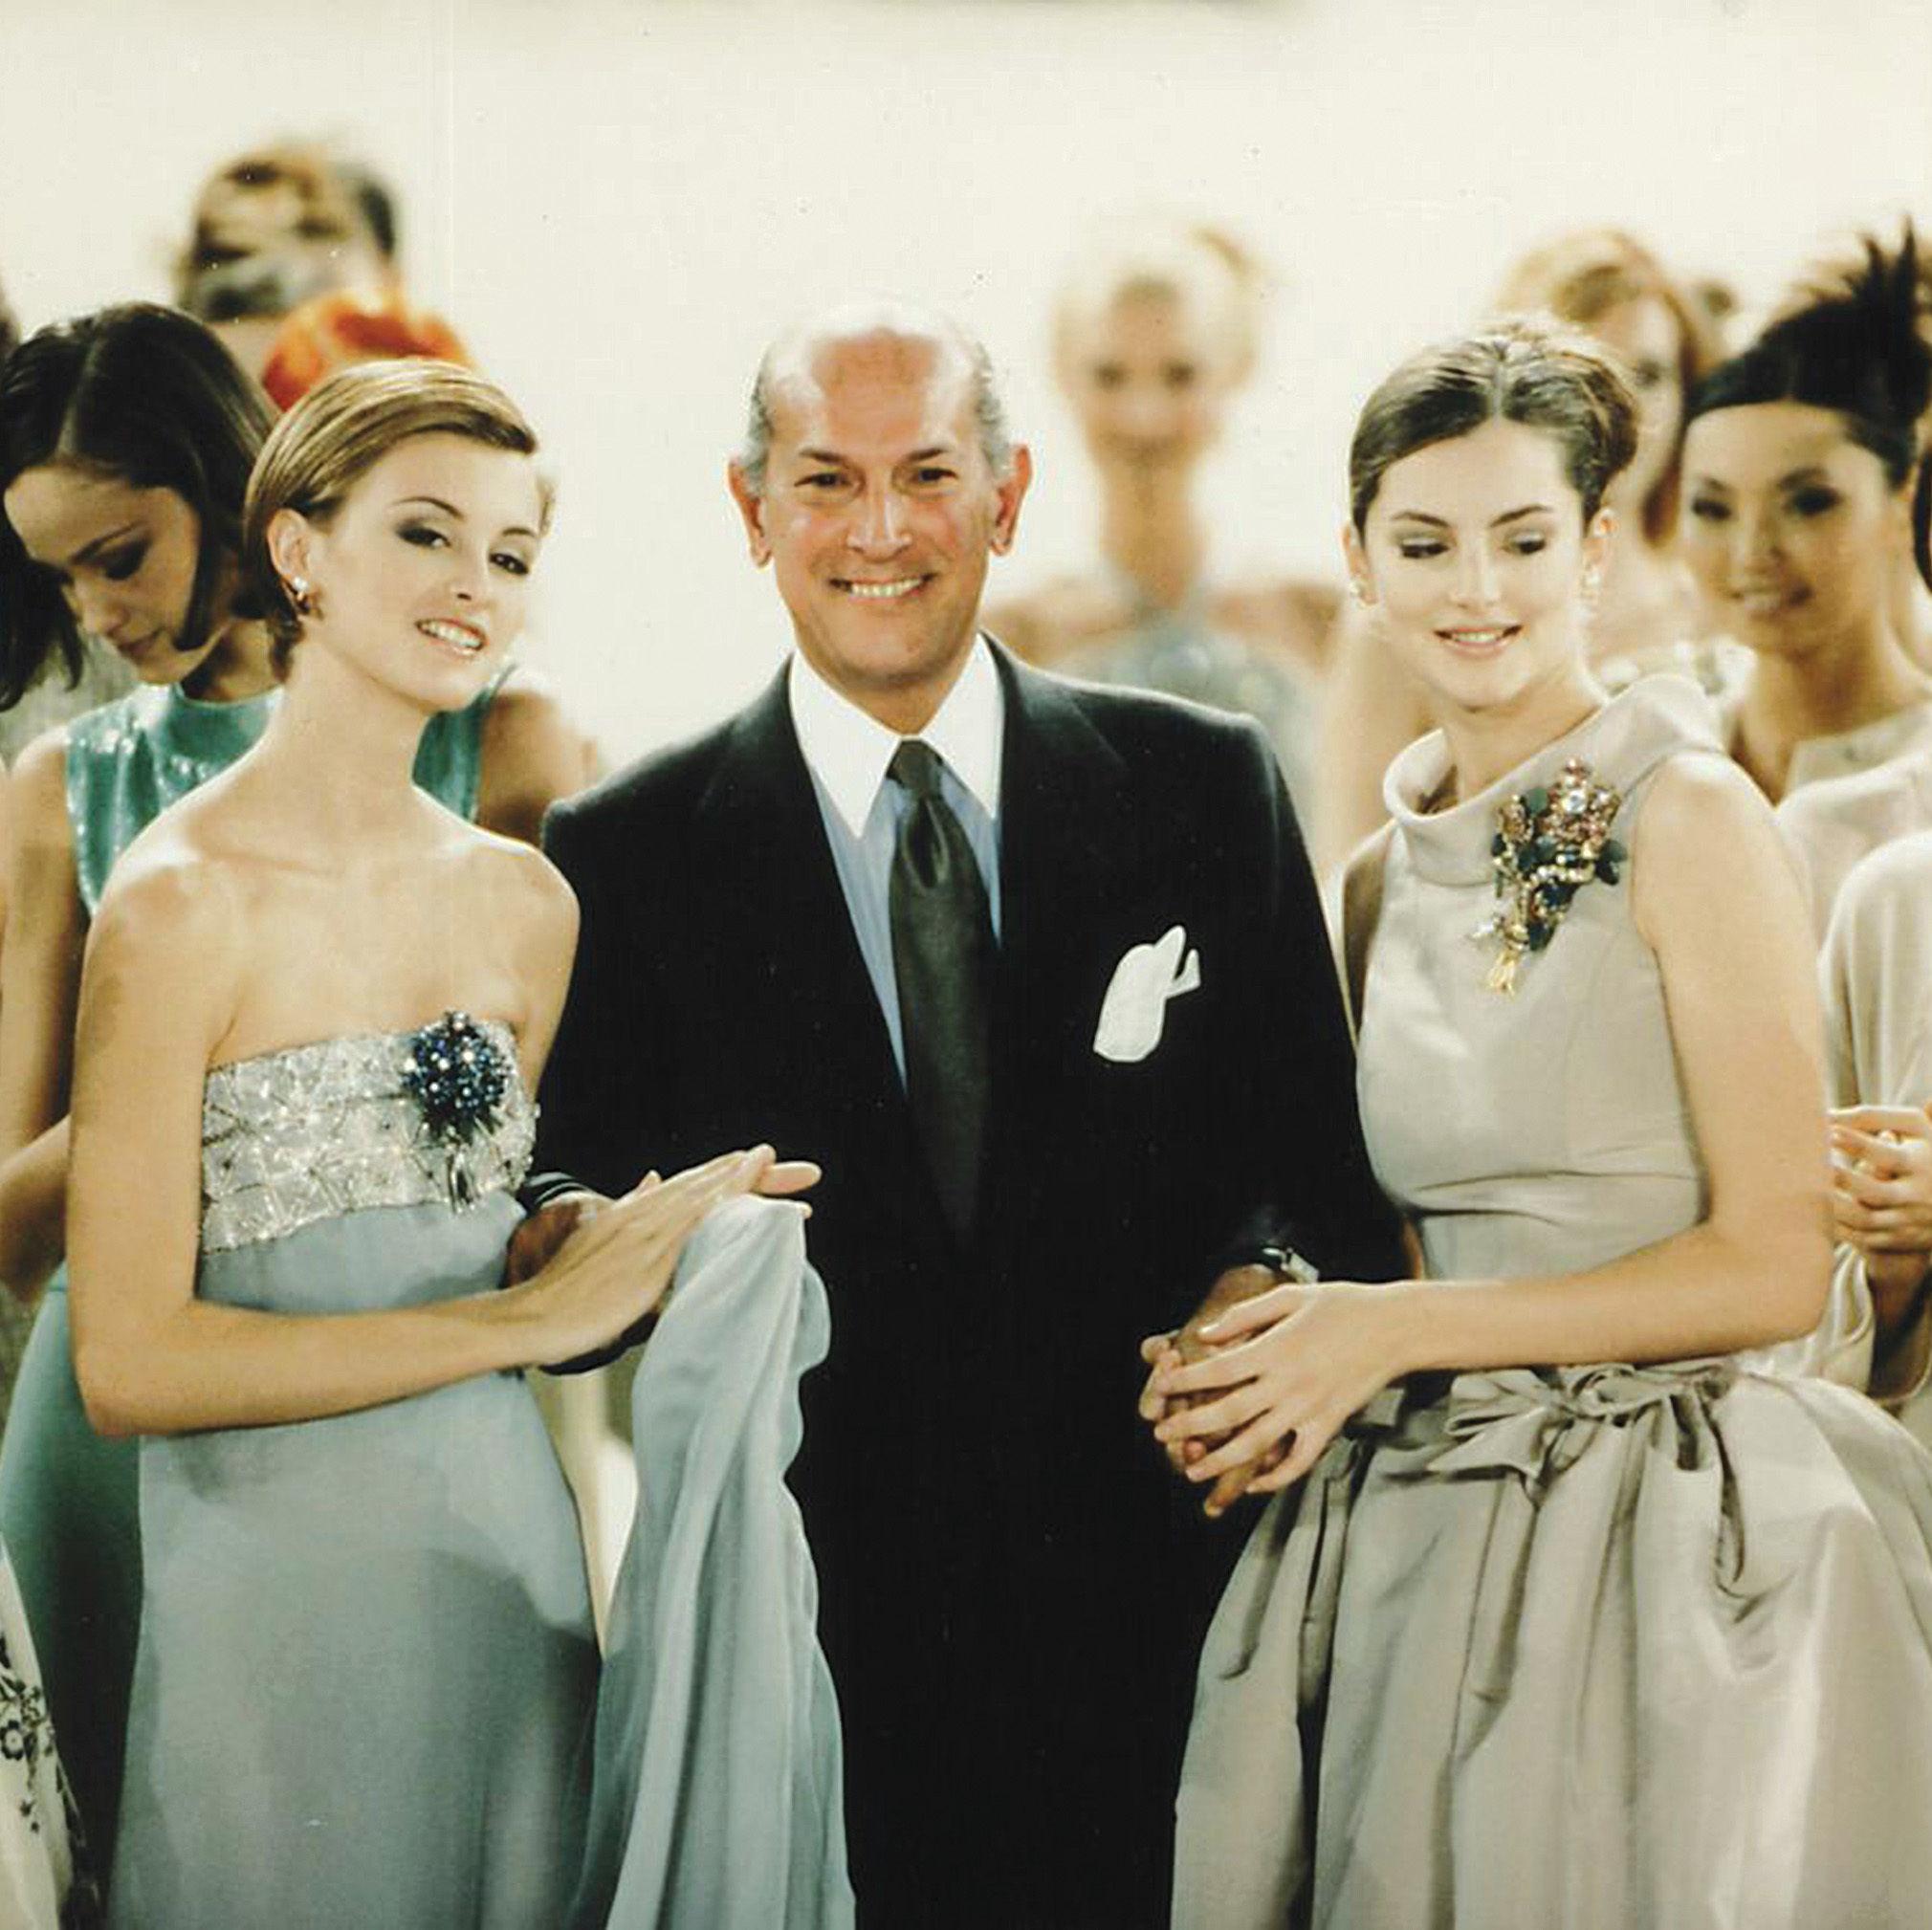 0917 fall arts oscar de la renta with models final of his spring 1996 fashion show pwtkcw